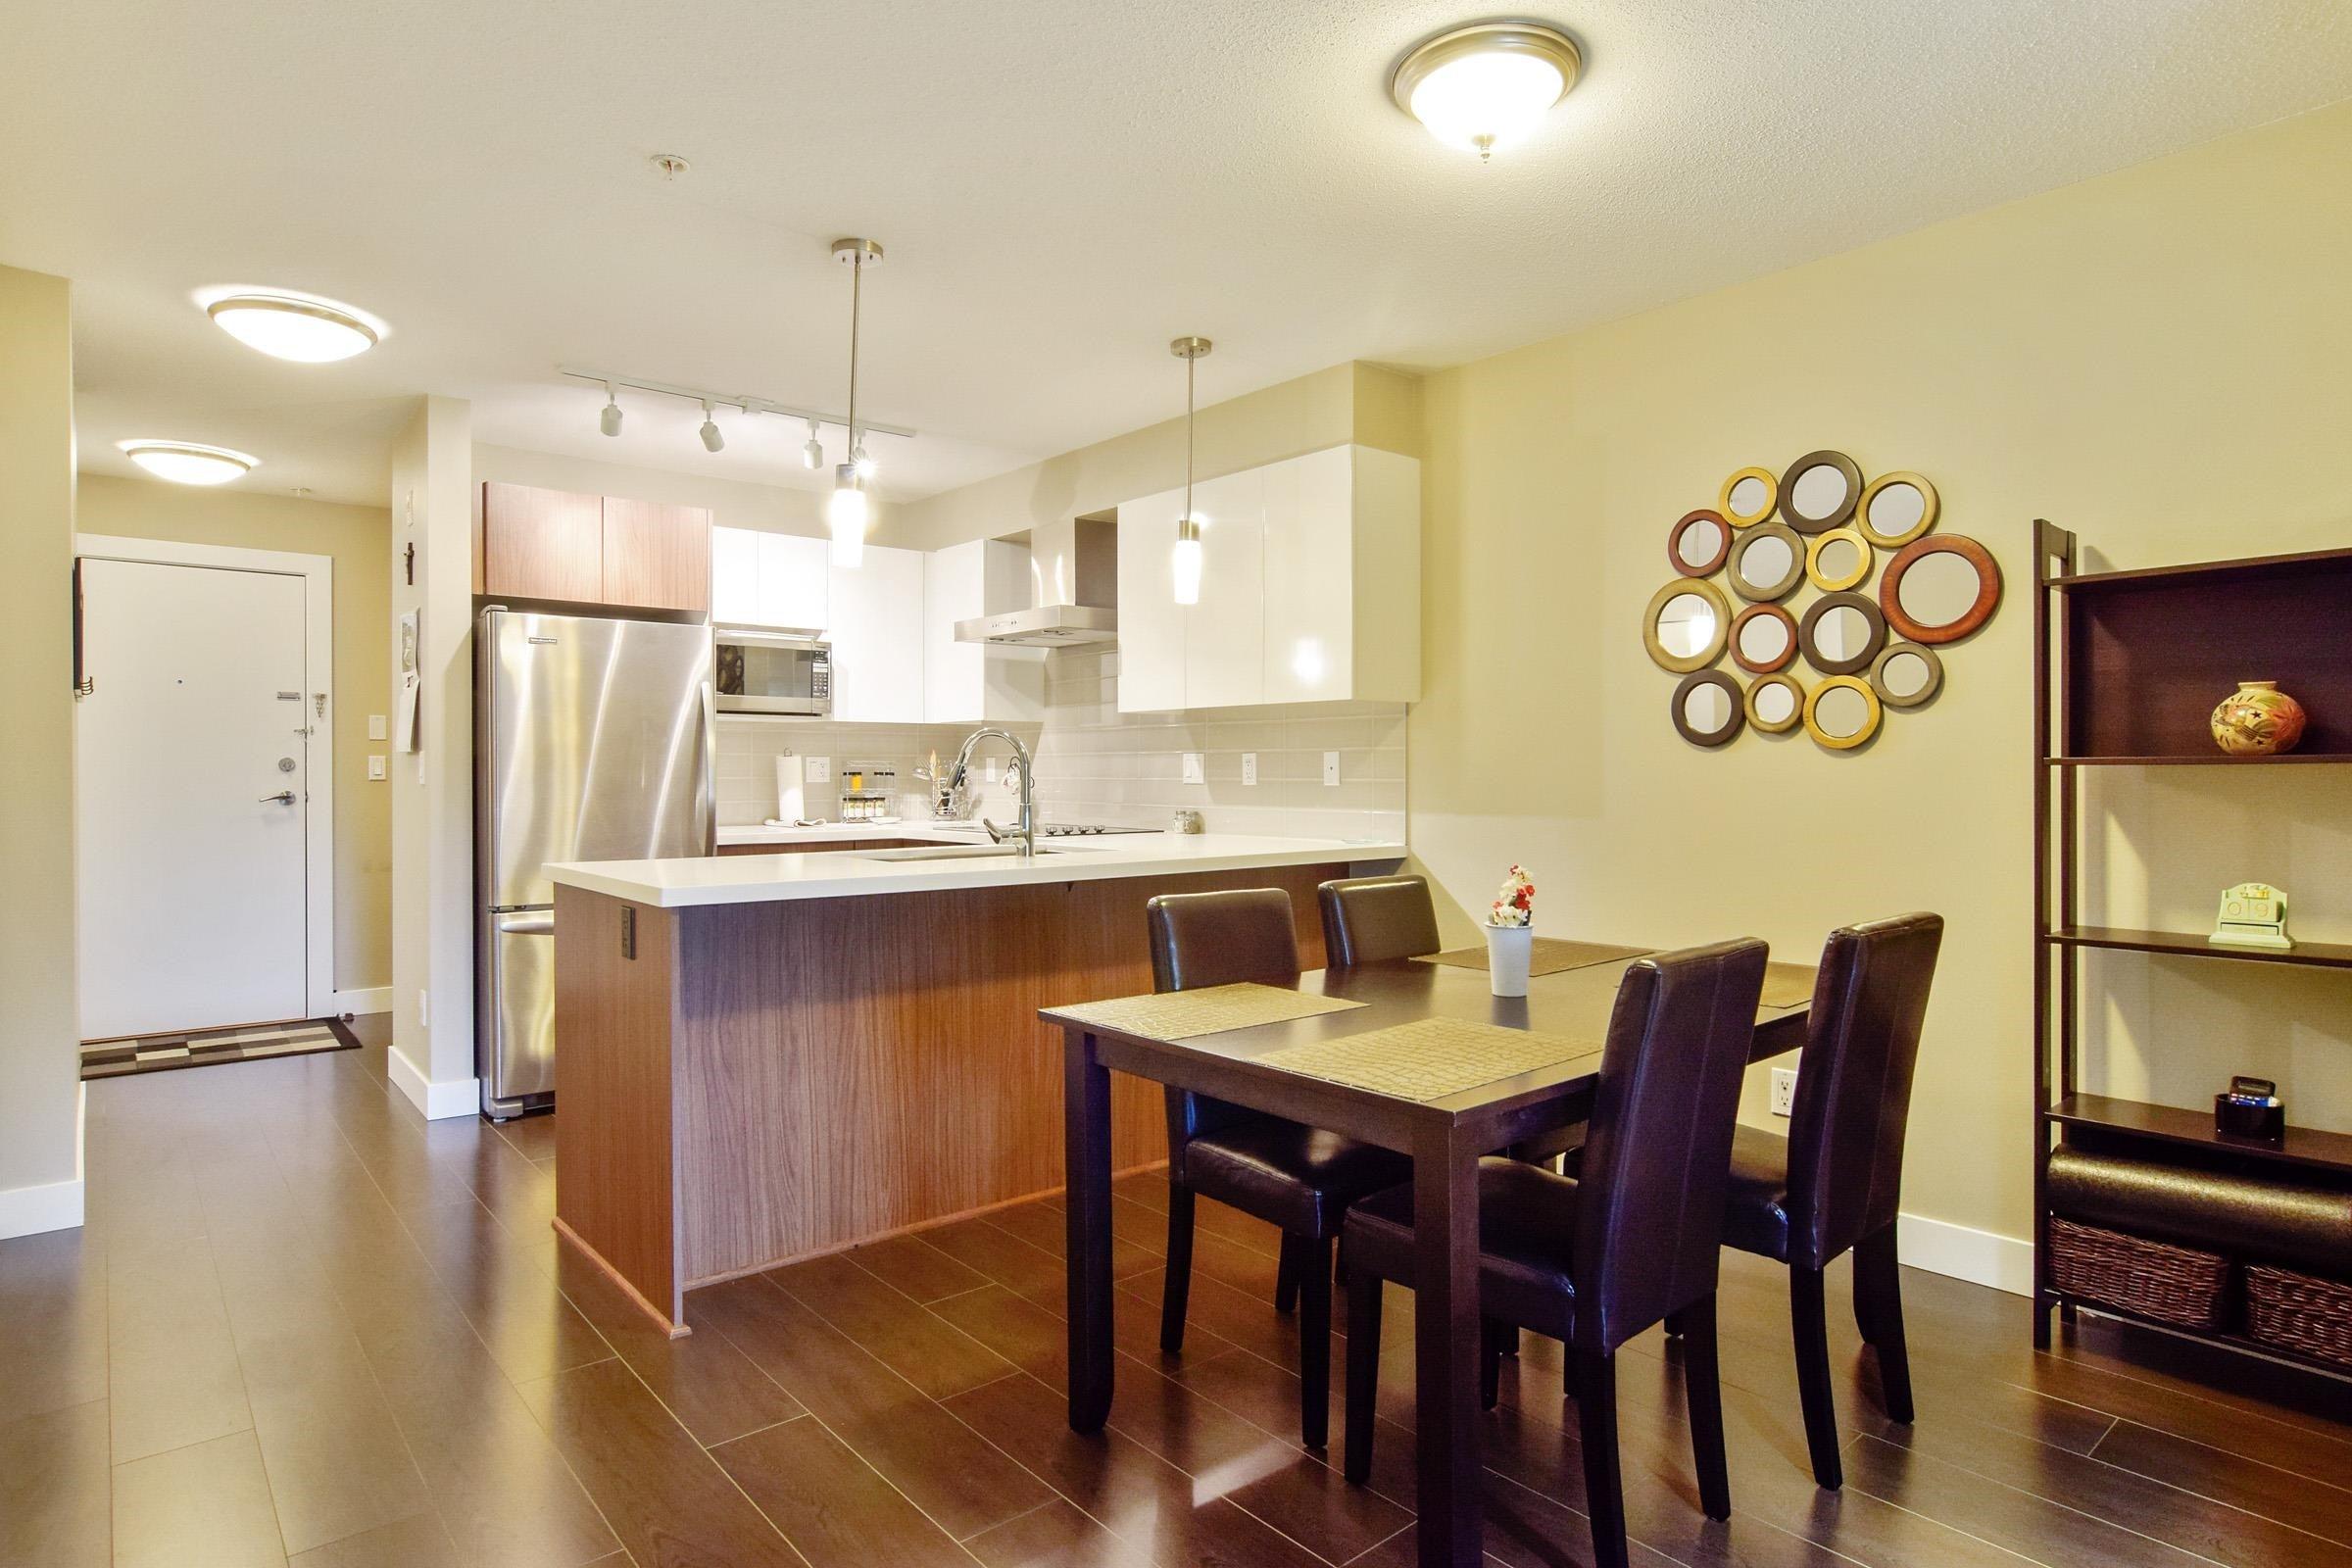 301 7131 STRIDE AVENUE - Edmonds BE Apartment/Condo for sale, 1 Bedroom (R2625669) - #5